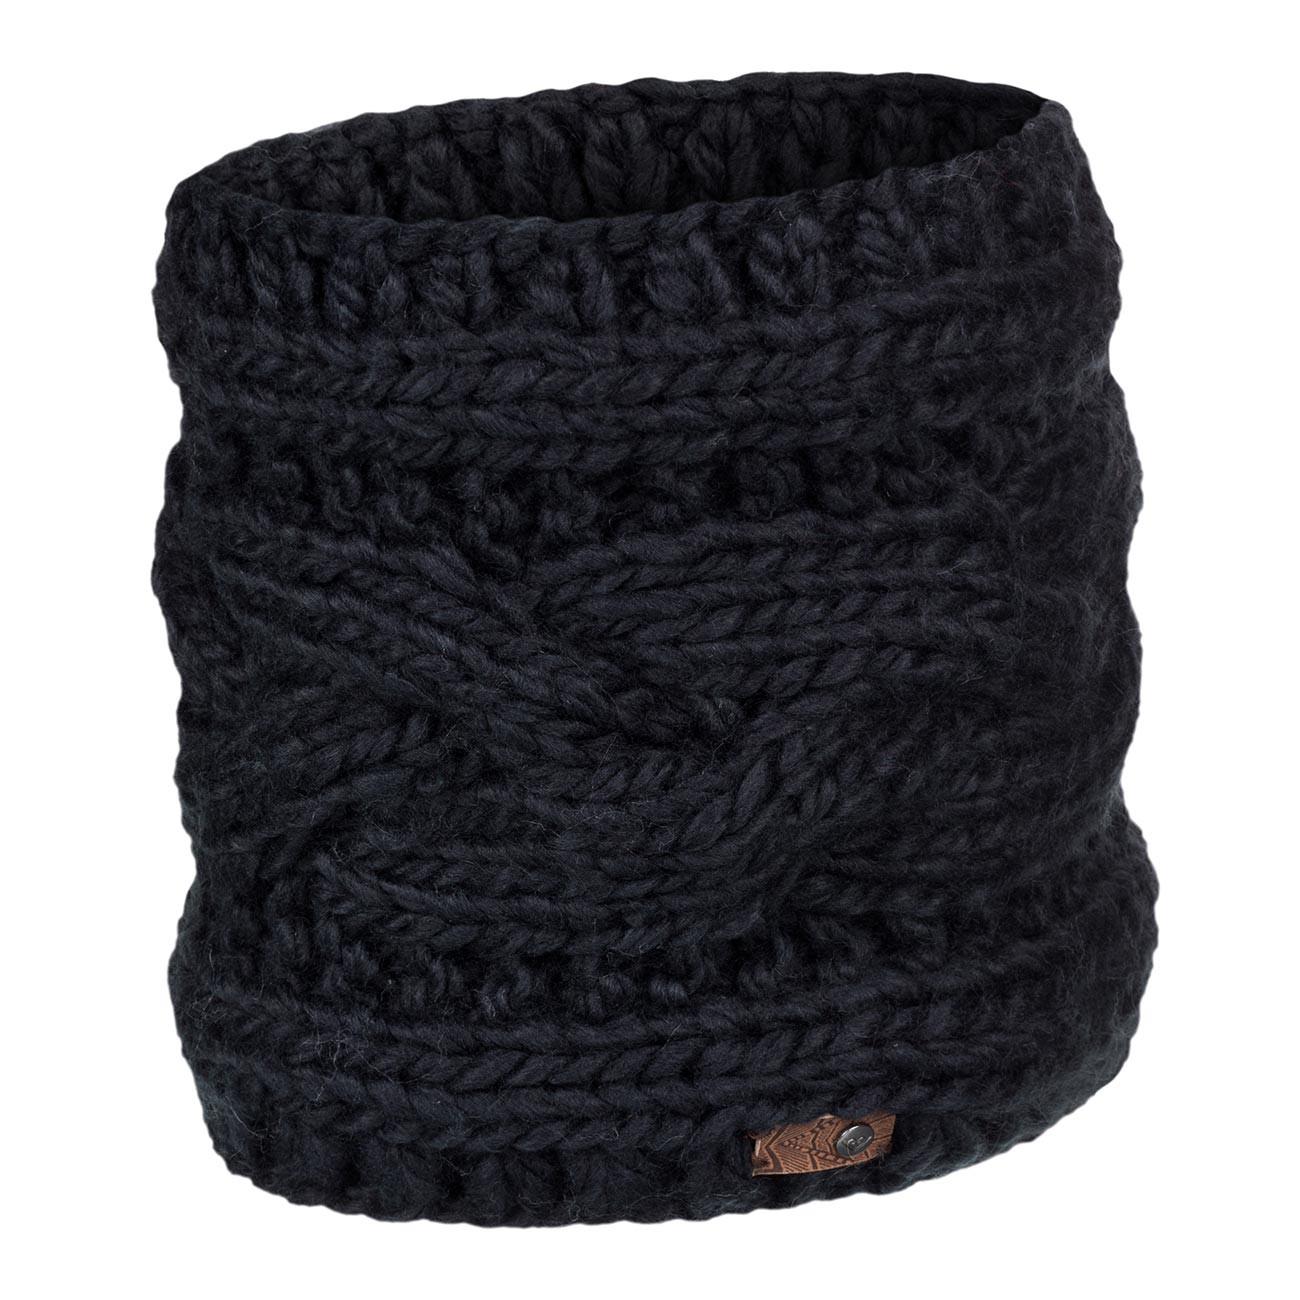 Nákrčník Roxy Winter Collar true black